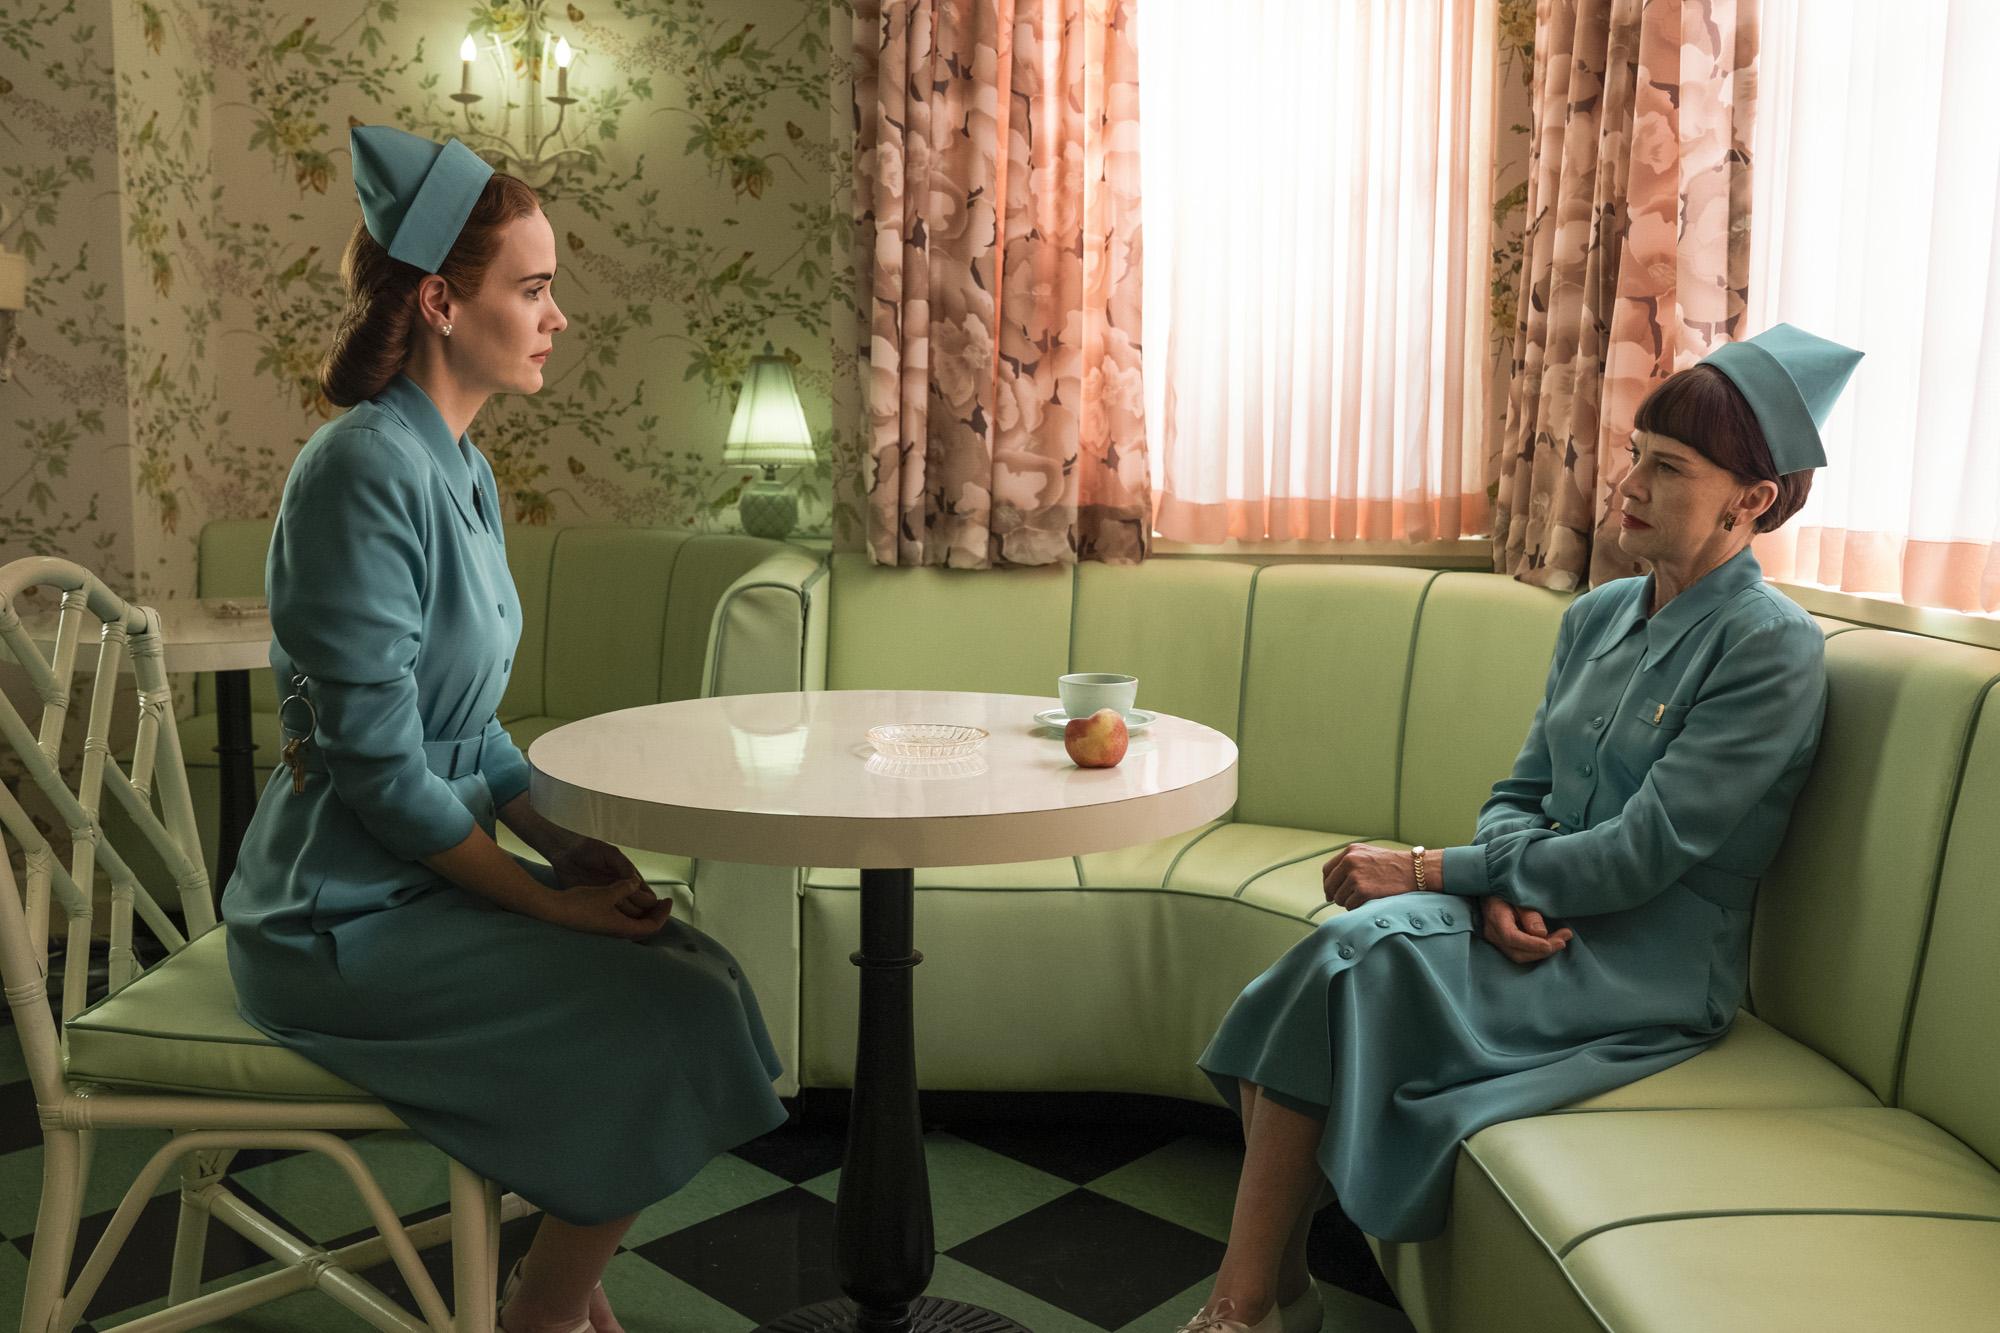 Ratched review: Netflix's prequel is a crazy misfire | EW.com